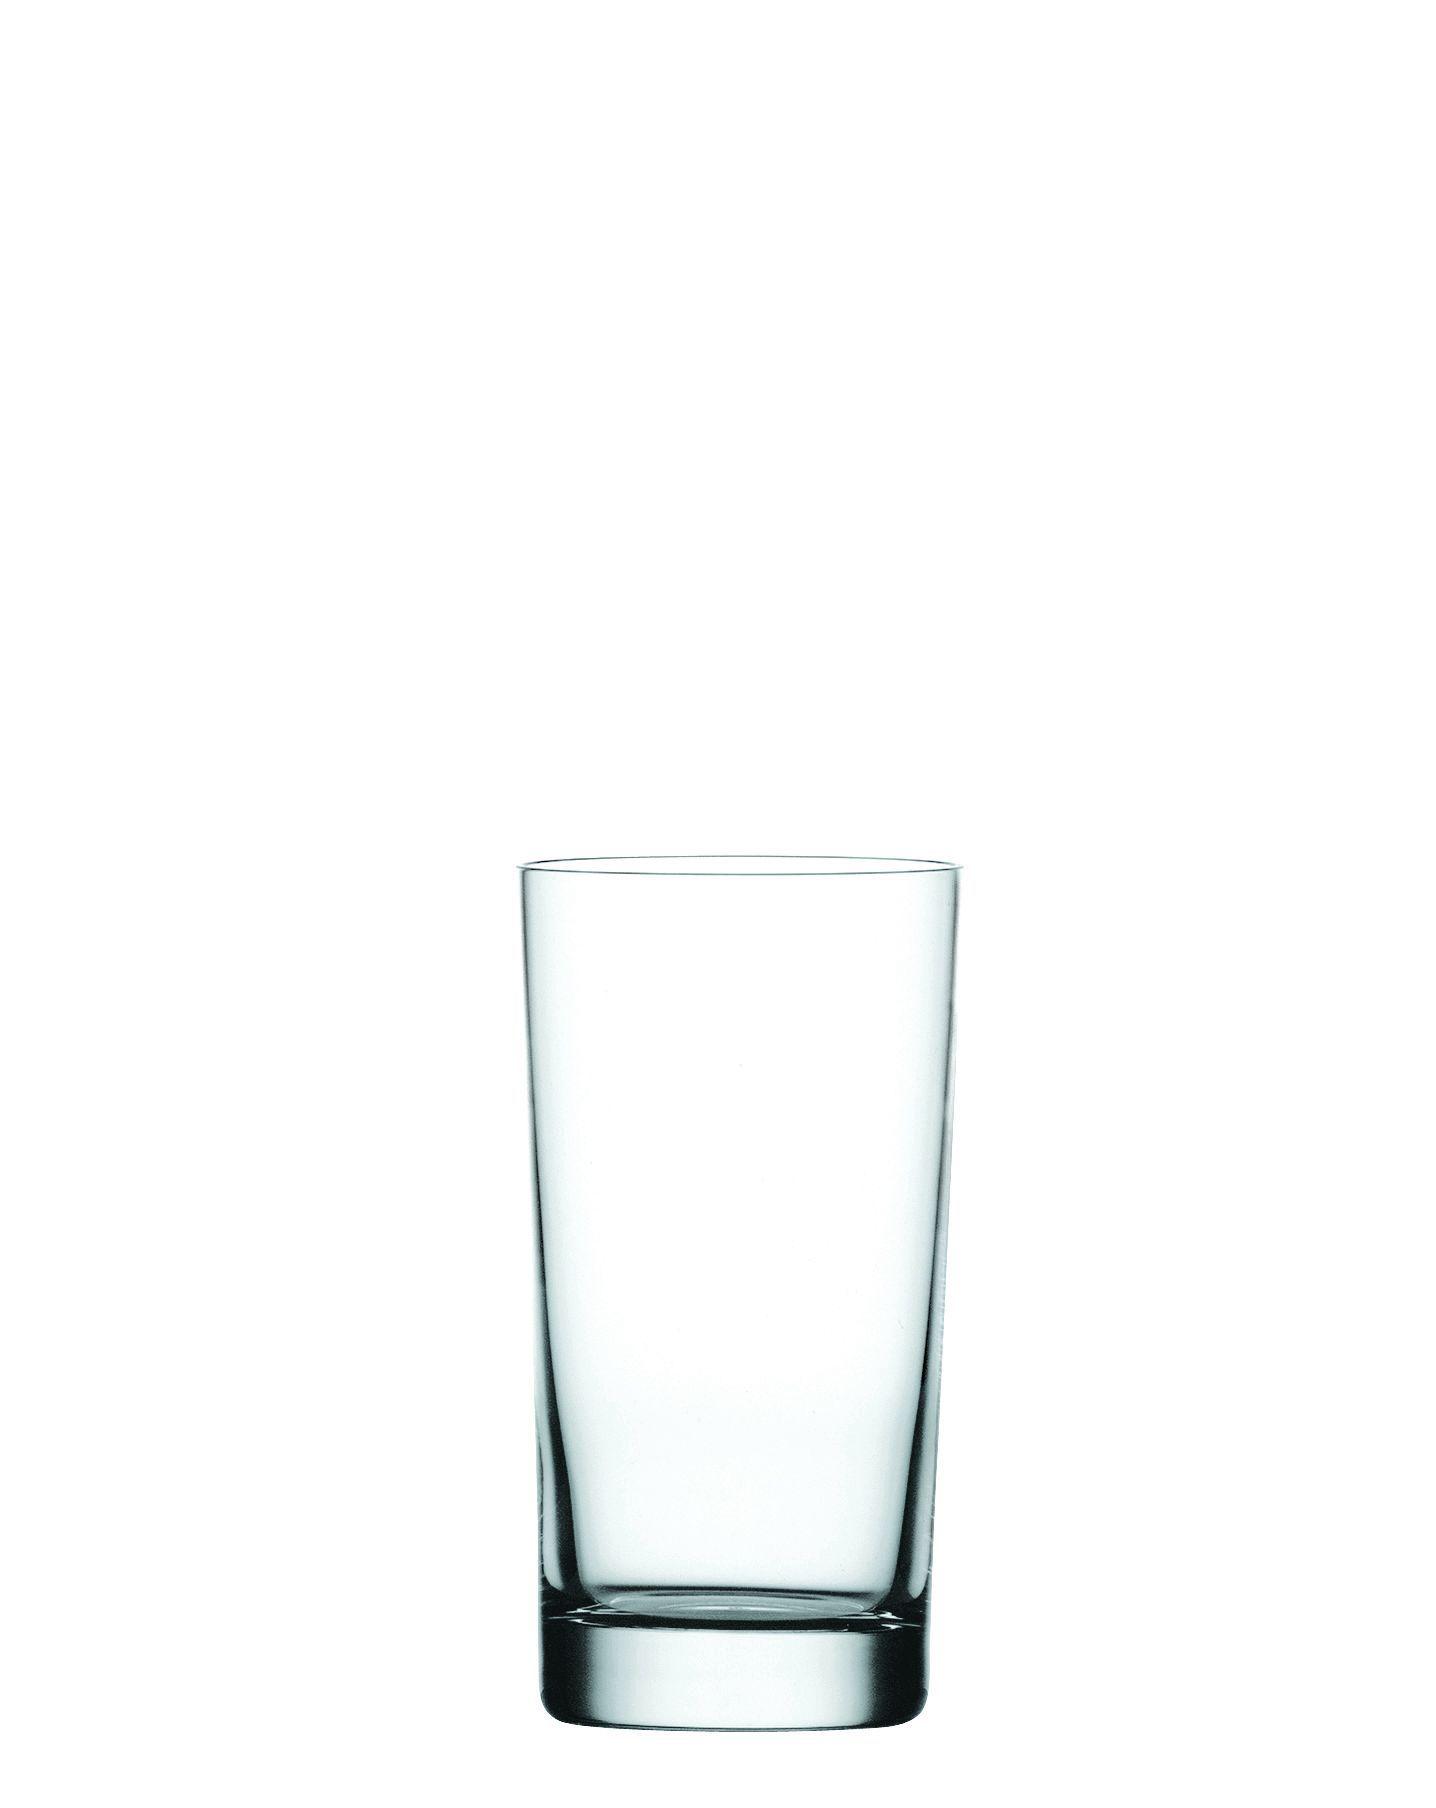 Стаканы Стакан для сока 345мл Nachtmann Classic Fruit Juice Tumbler stakan-dlya-soka-345ml-nachtmann-classic-fruit-juice-tumbler-germaniya.jpg